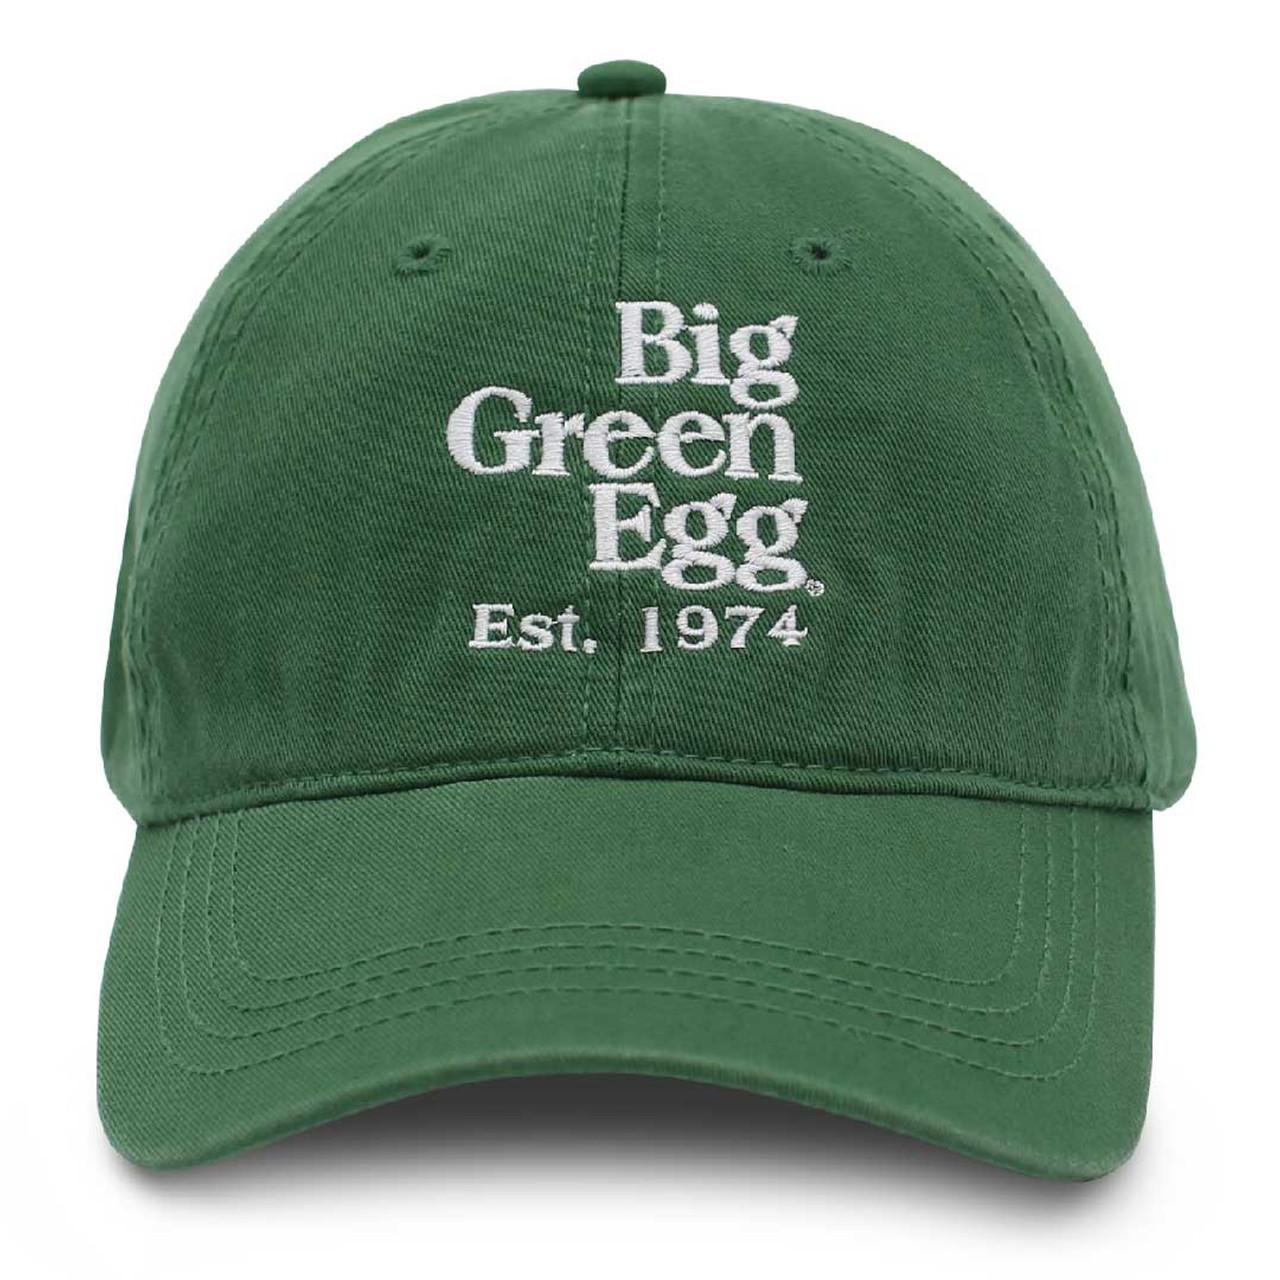 Big Green Egg Relaxed Est. 1974 Cap – Green